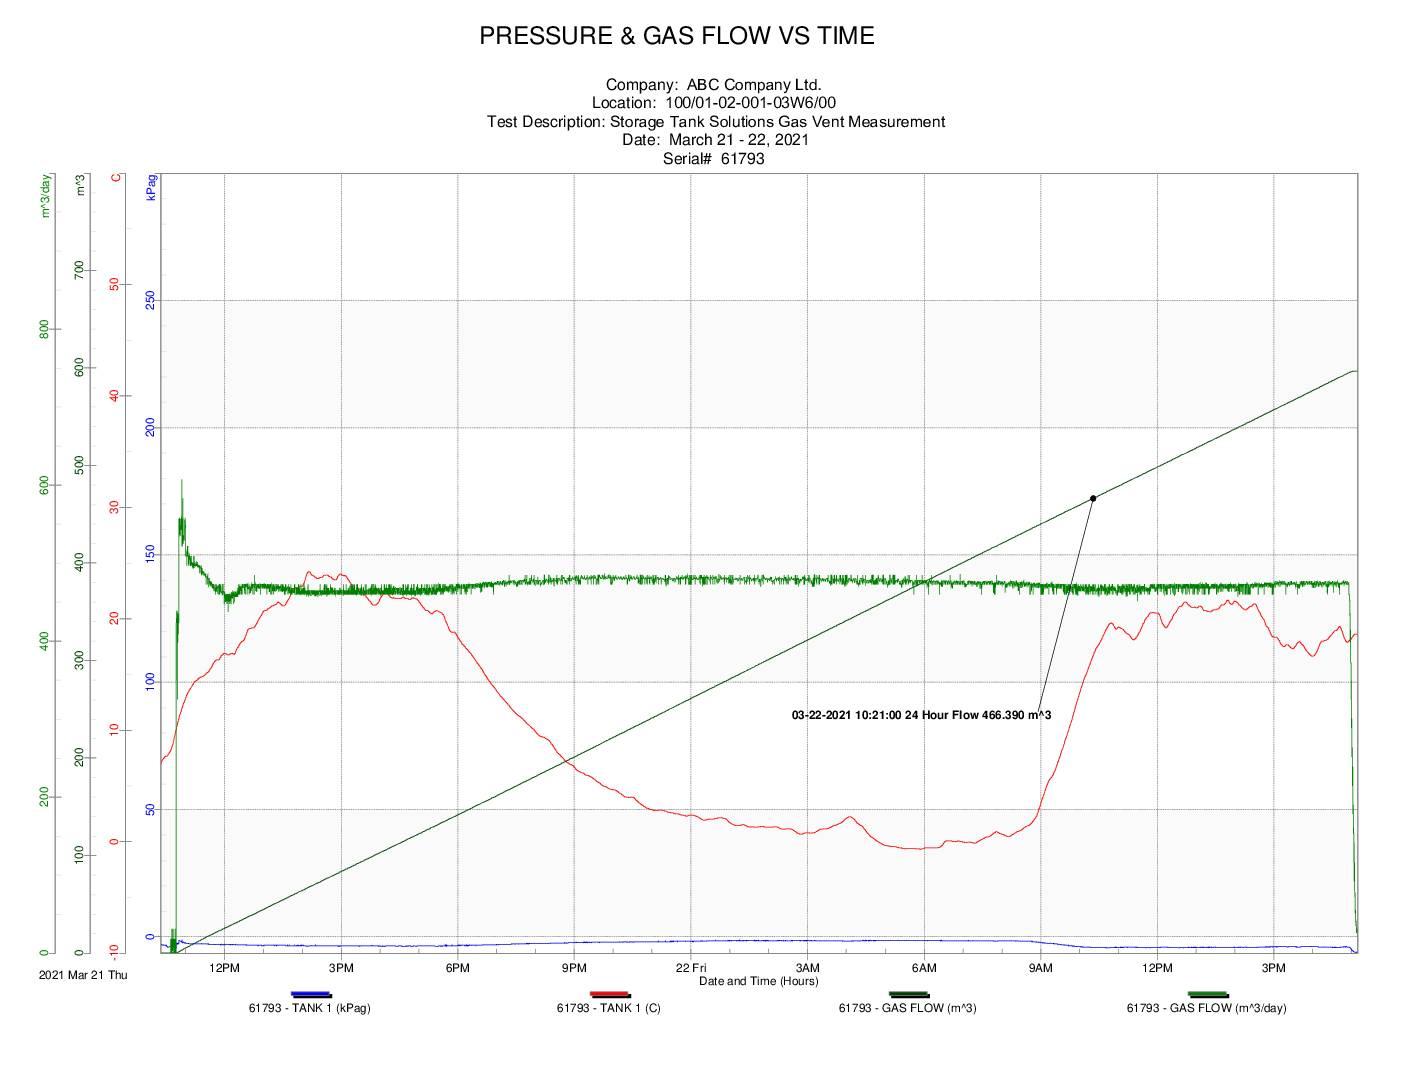 Storage Tank Solutions Gas Vent Measurement Example Graph